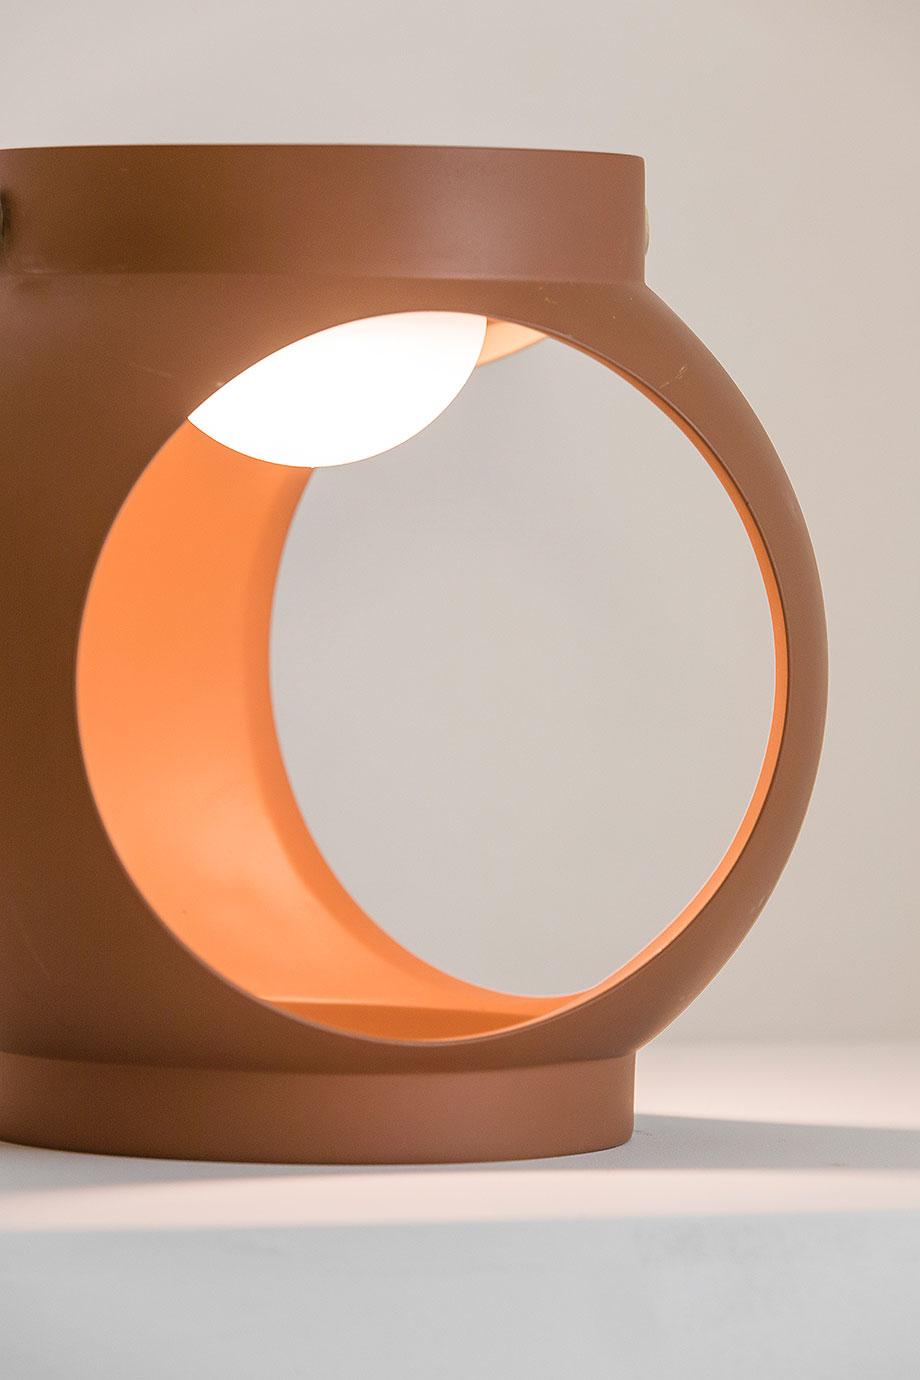 lampara portatil candela de estudi ribaudi y faro barcelona (6)